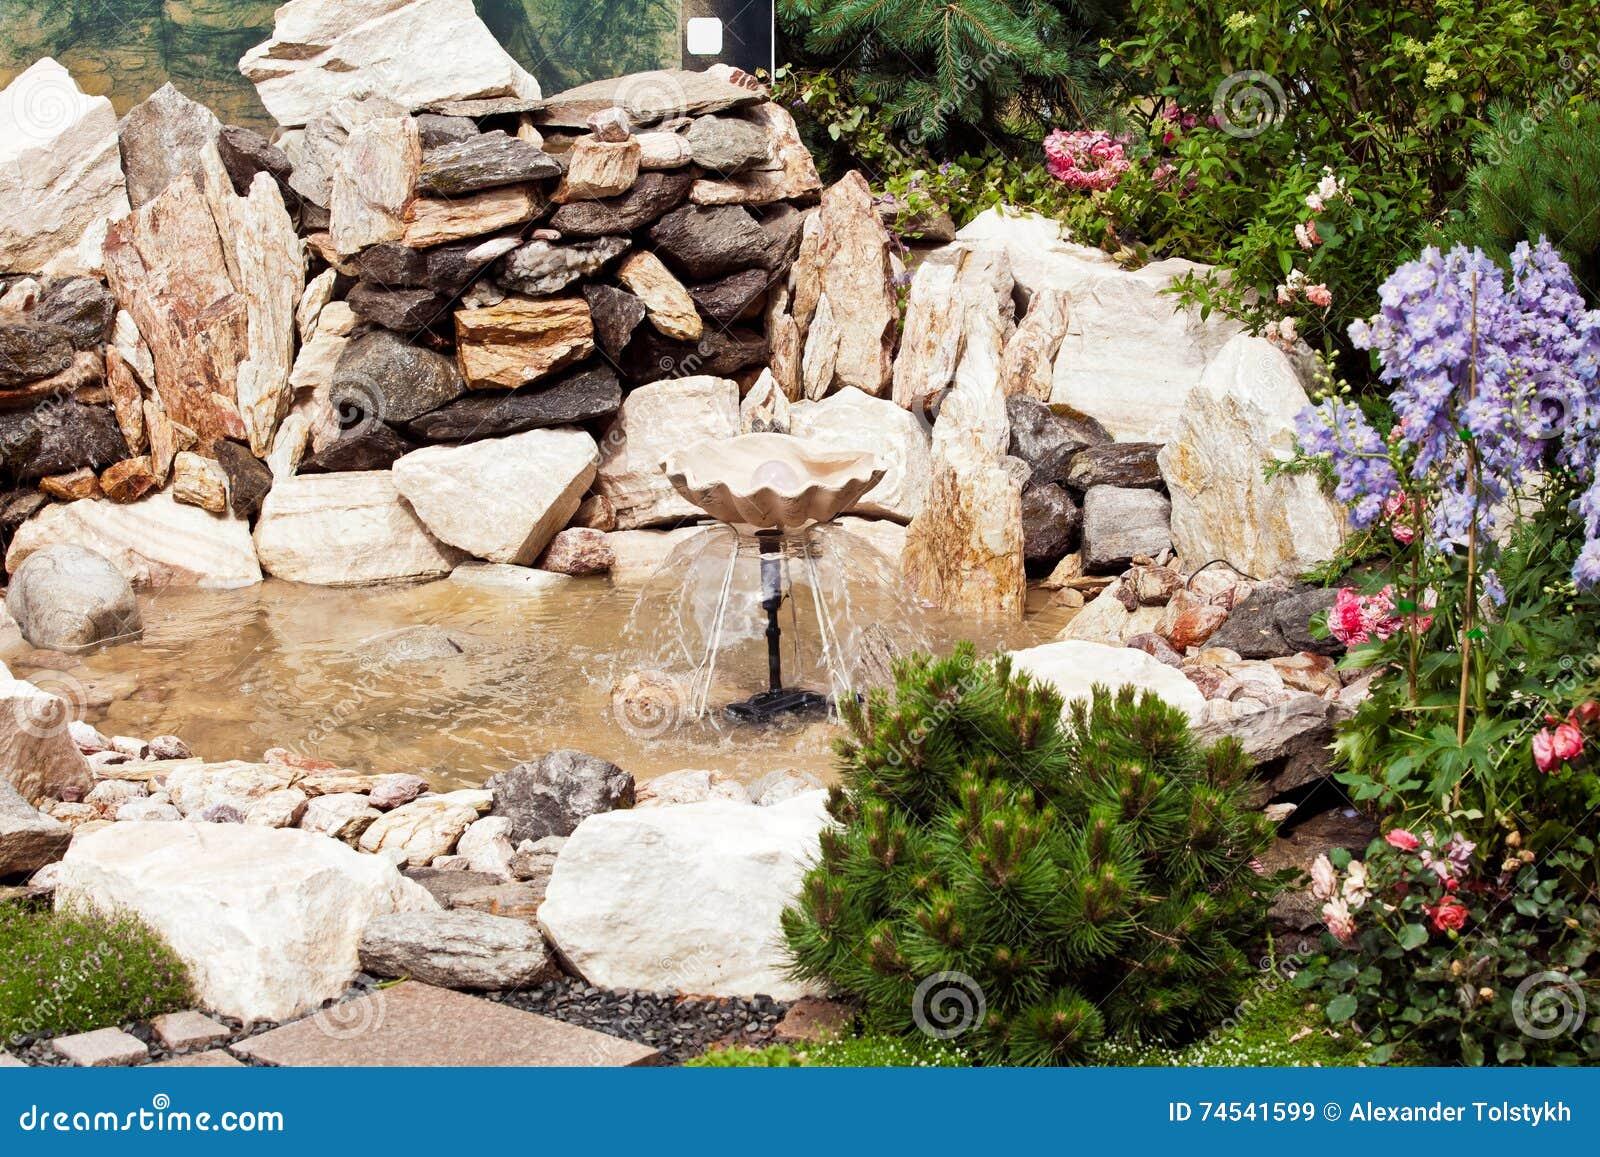 Fontana di pietra nel giardino immagine stock immagine di giardinaggio disegno 74541599 - Fontana in pietra da giardino ...